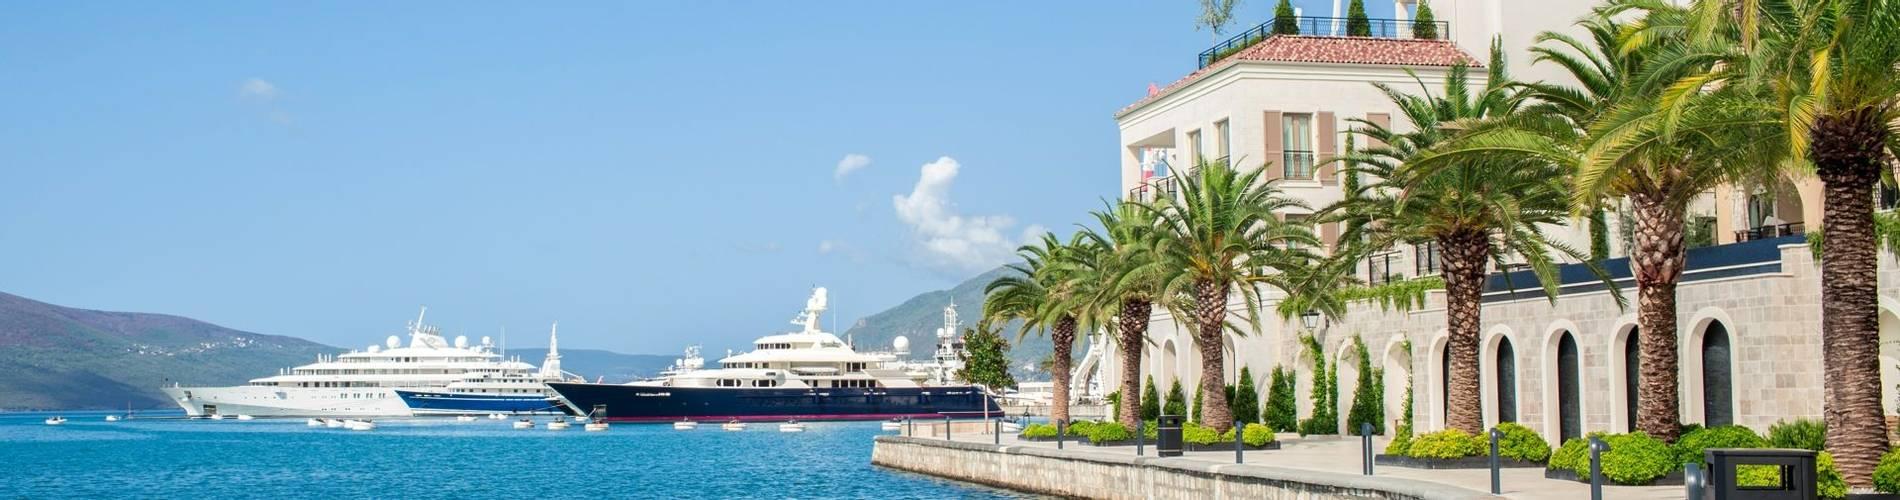 Tivat city Montenegro.jpg